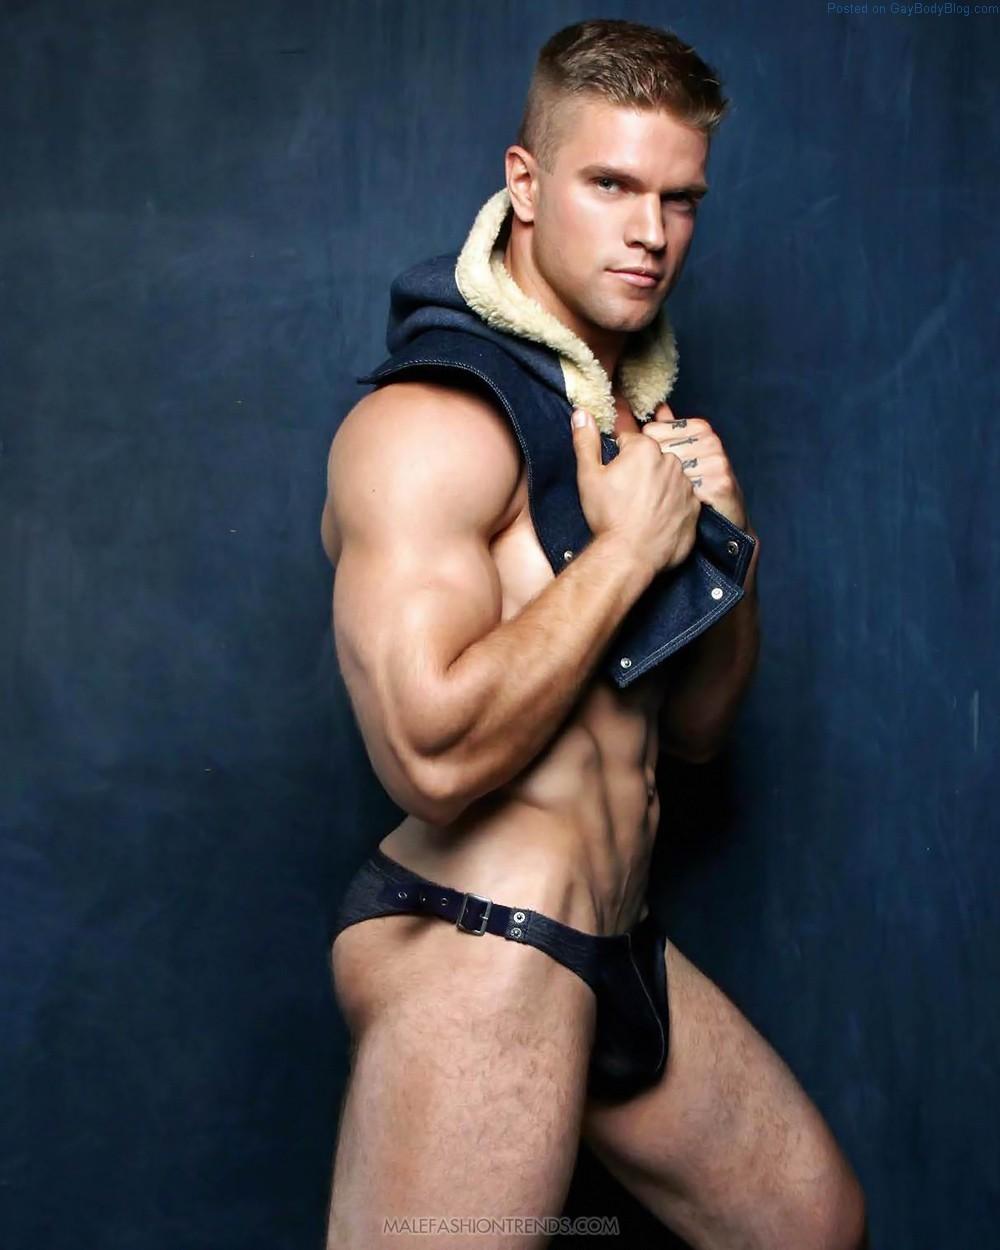 Lustful Gay Guys Hot Bareback